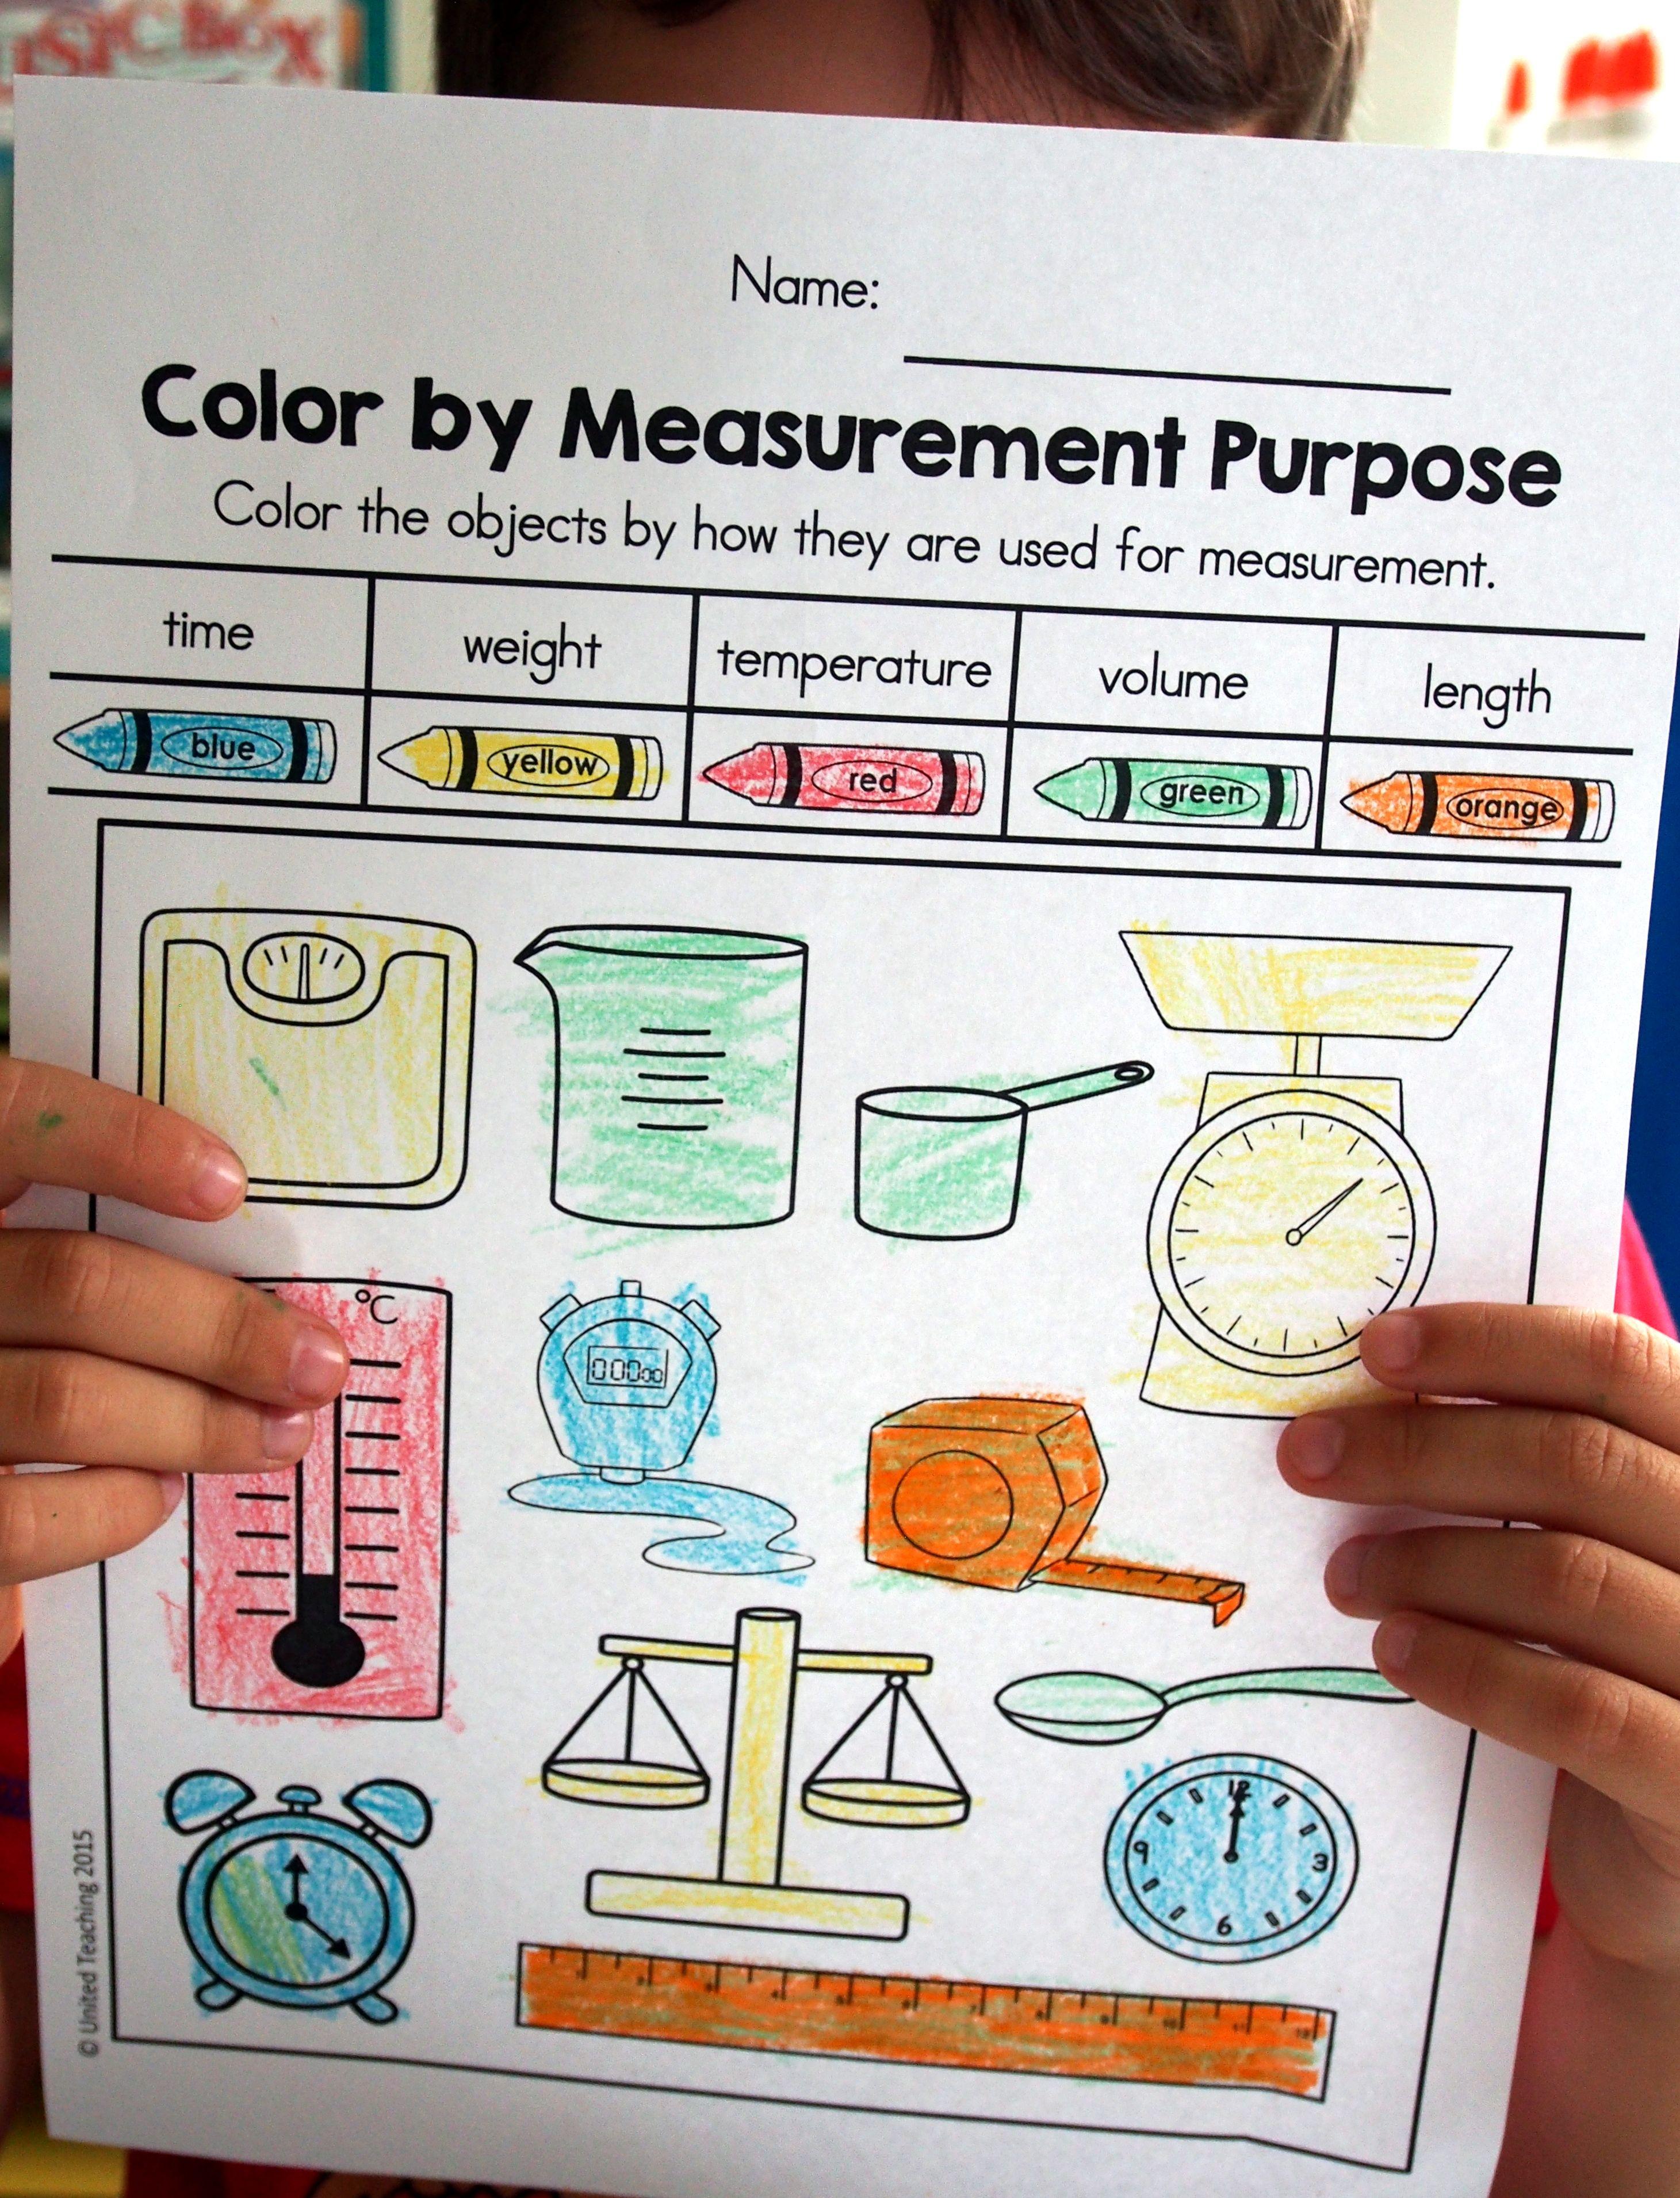 Spring Math Worksheets 1st Grade Distance Learning Measurement Tools Worksheet Spring Math Worksheets Math Measurement